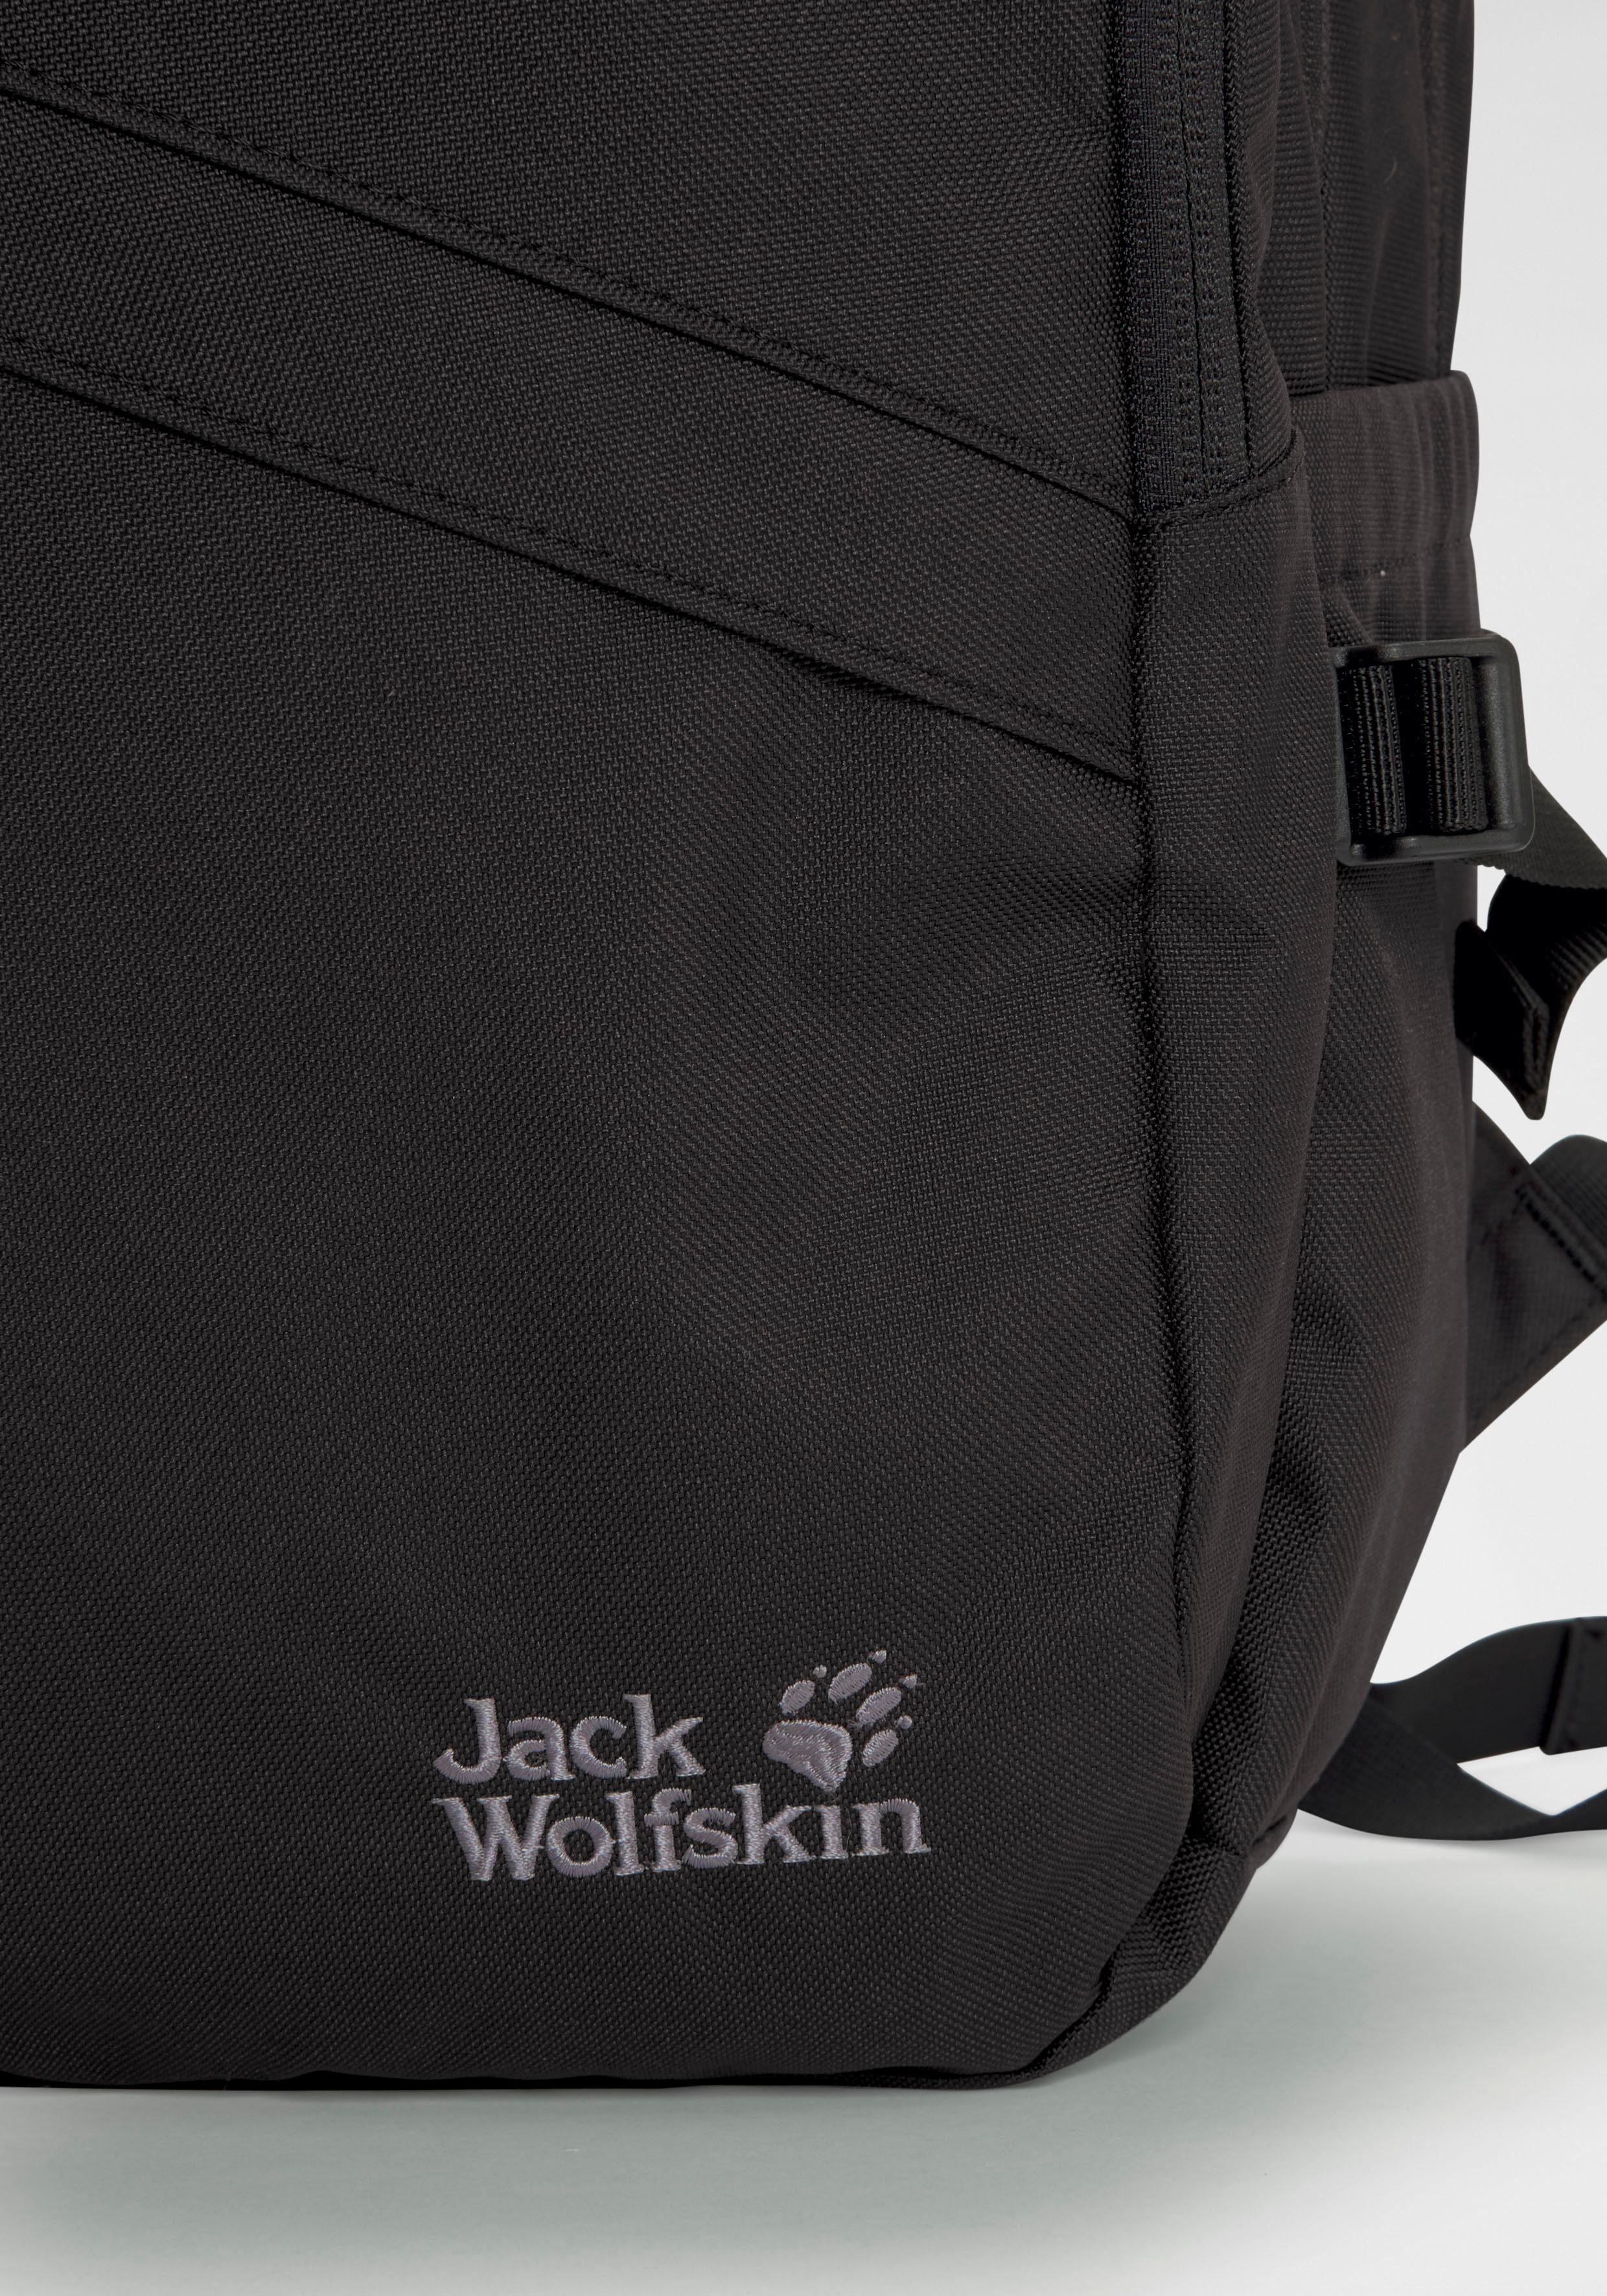 Wolfskin Jack Jack »dayton« »dayton« Wolfskin »dayton« Wolfskin Daypack Daypack Daypack Jack Bw6dqB7SR